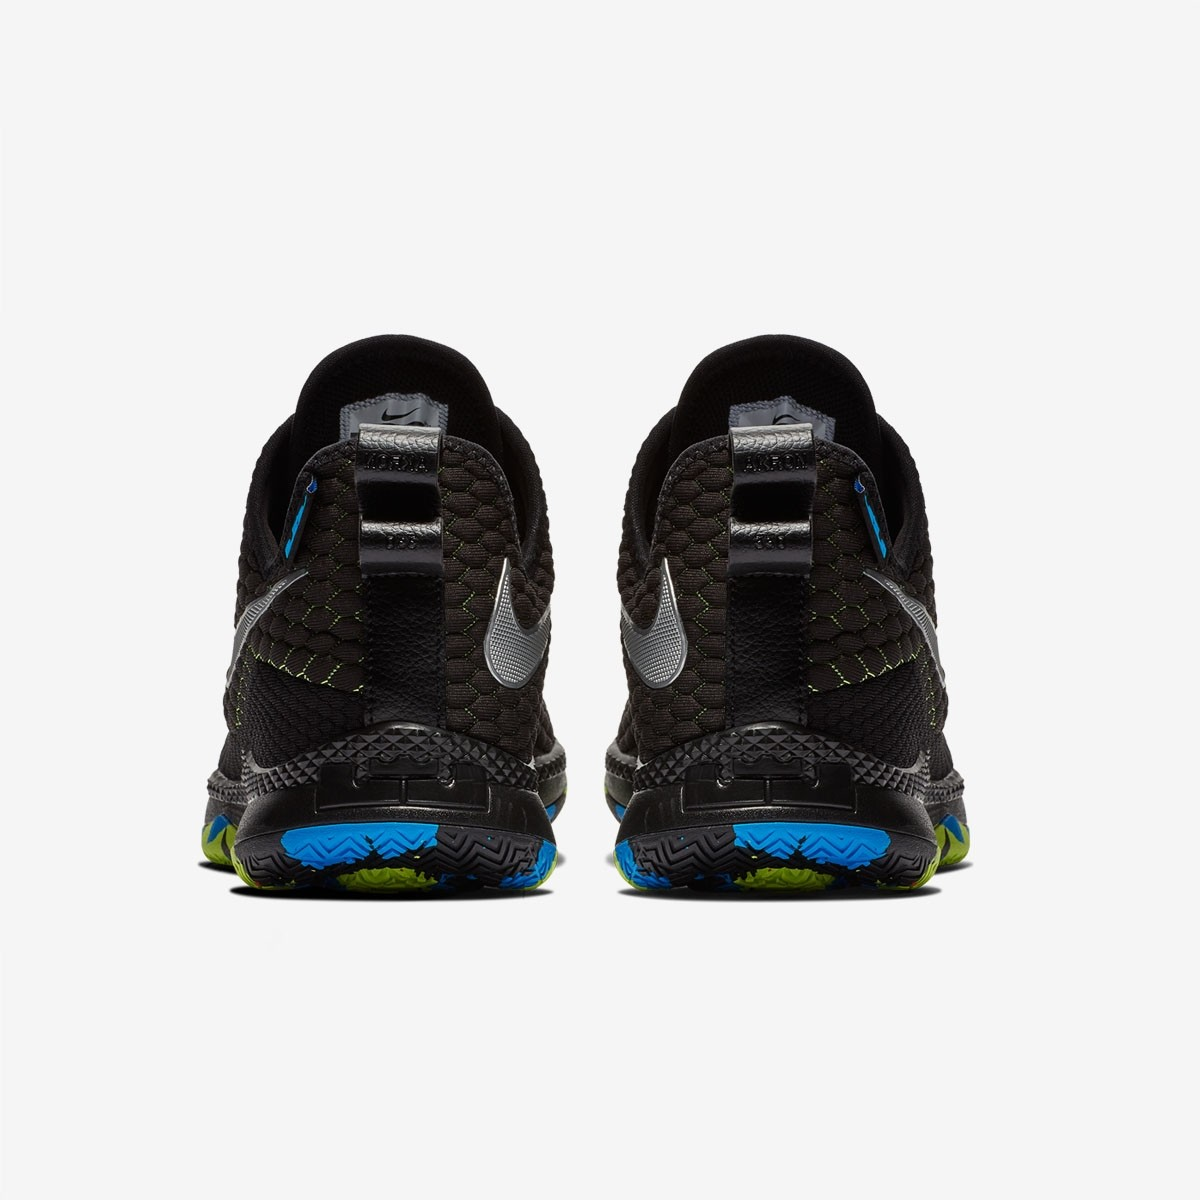 b10818ac5d32d Comprar Nike Lebron Witness III  I Promise  Zapatillas Baloncesto y ...